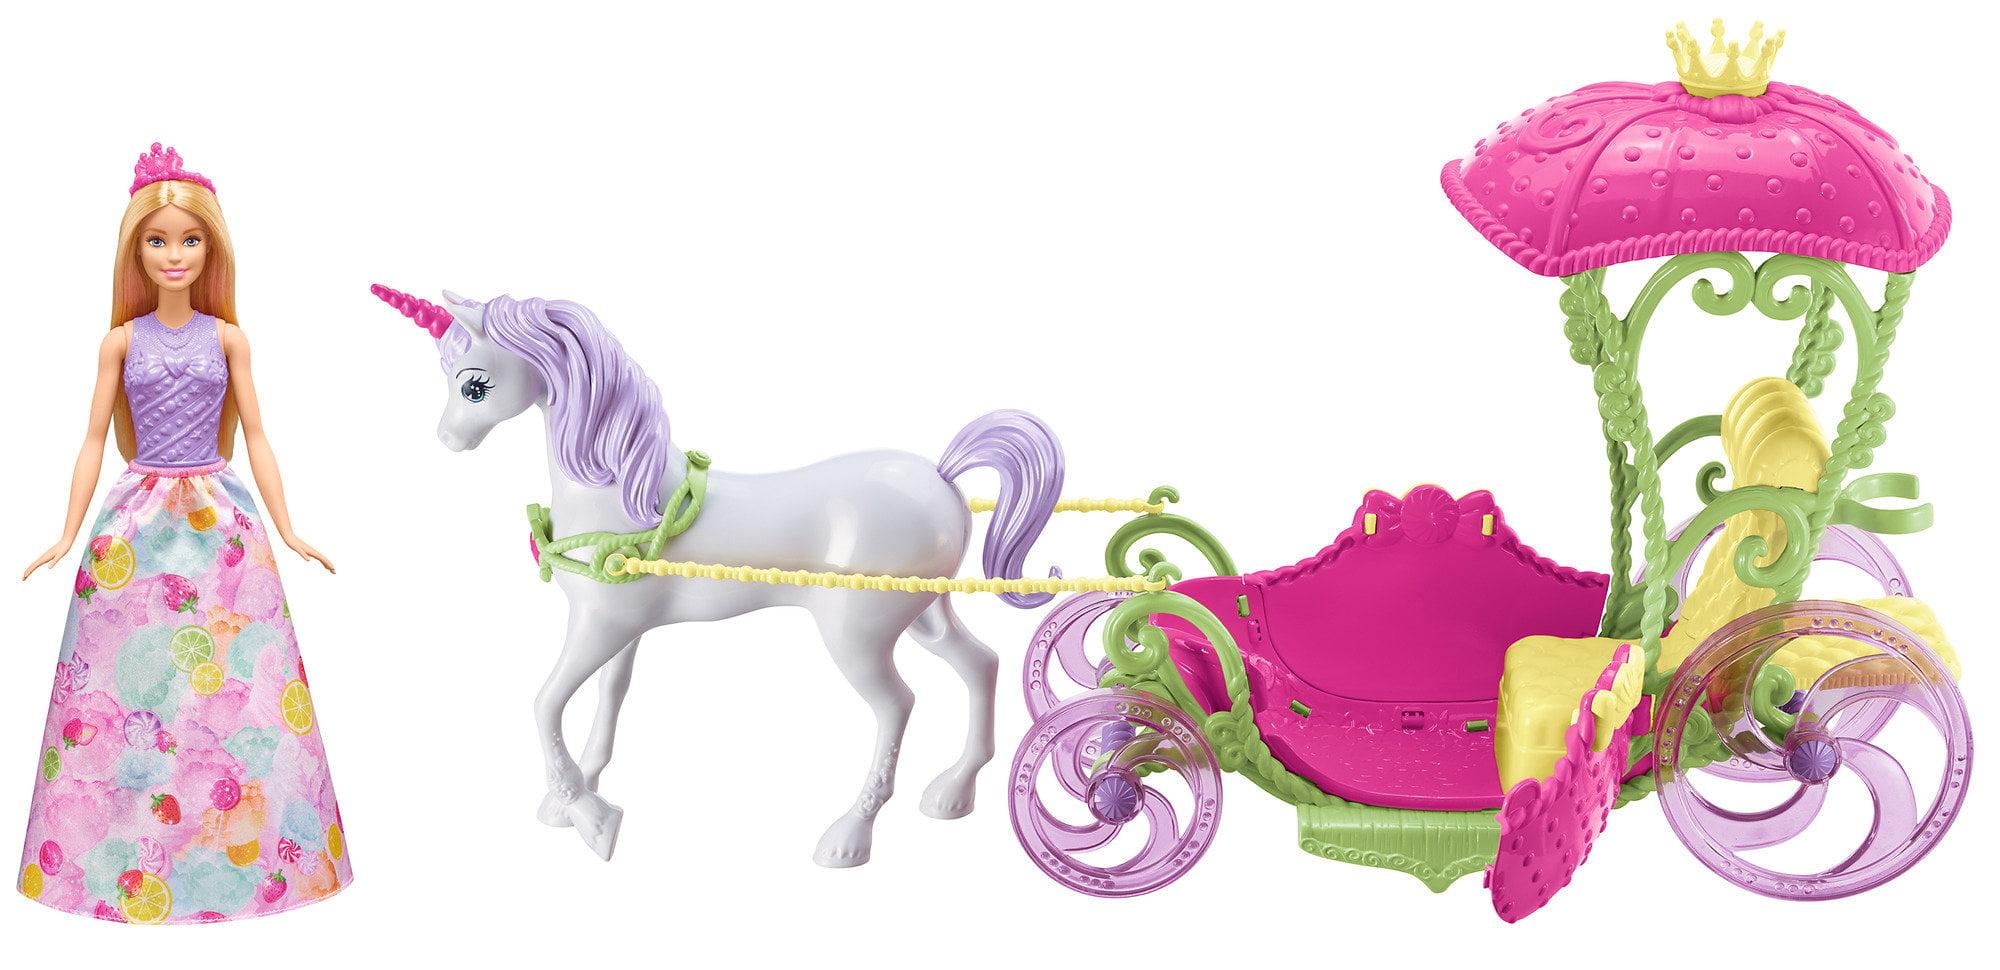 Barbie Dreamtopia Sweetville Carriage by Mattel